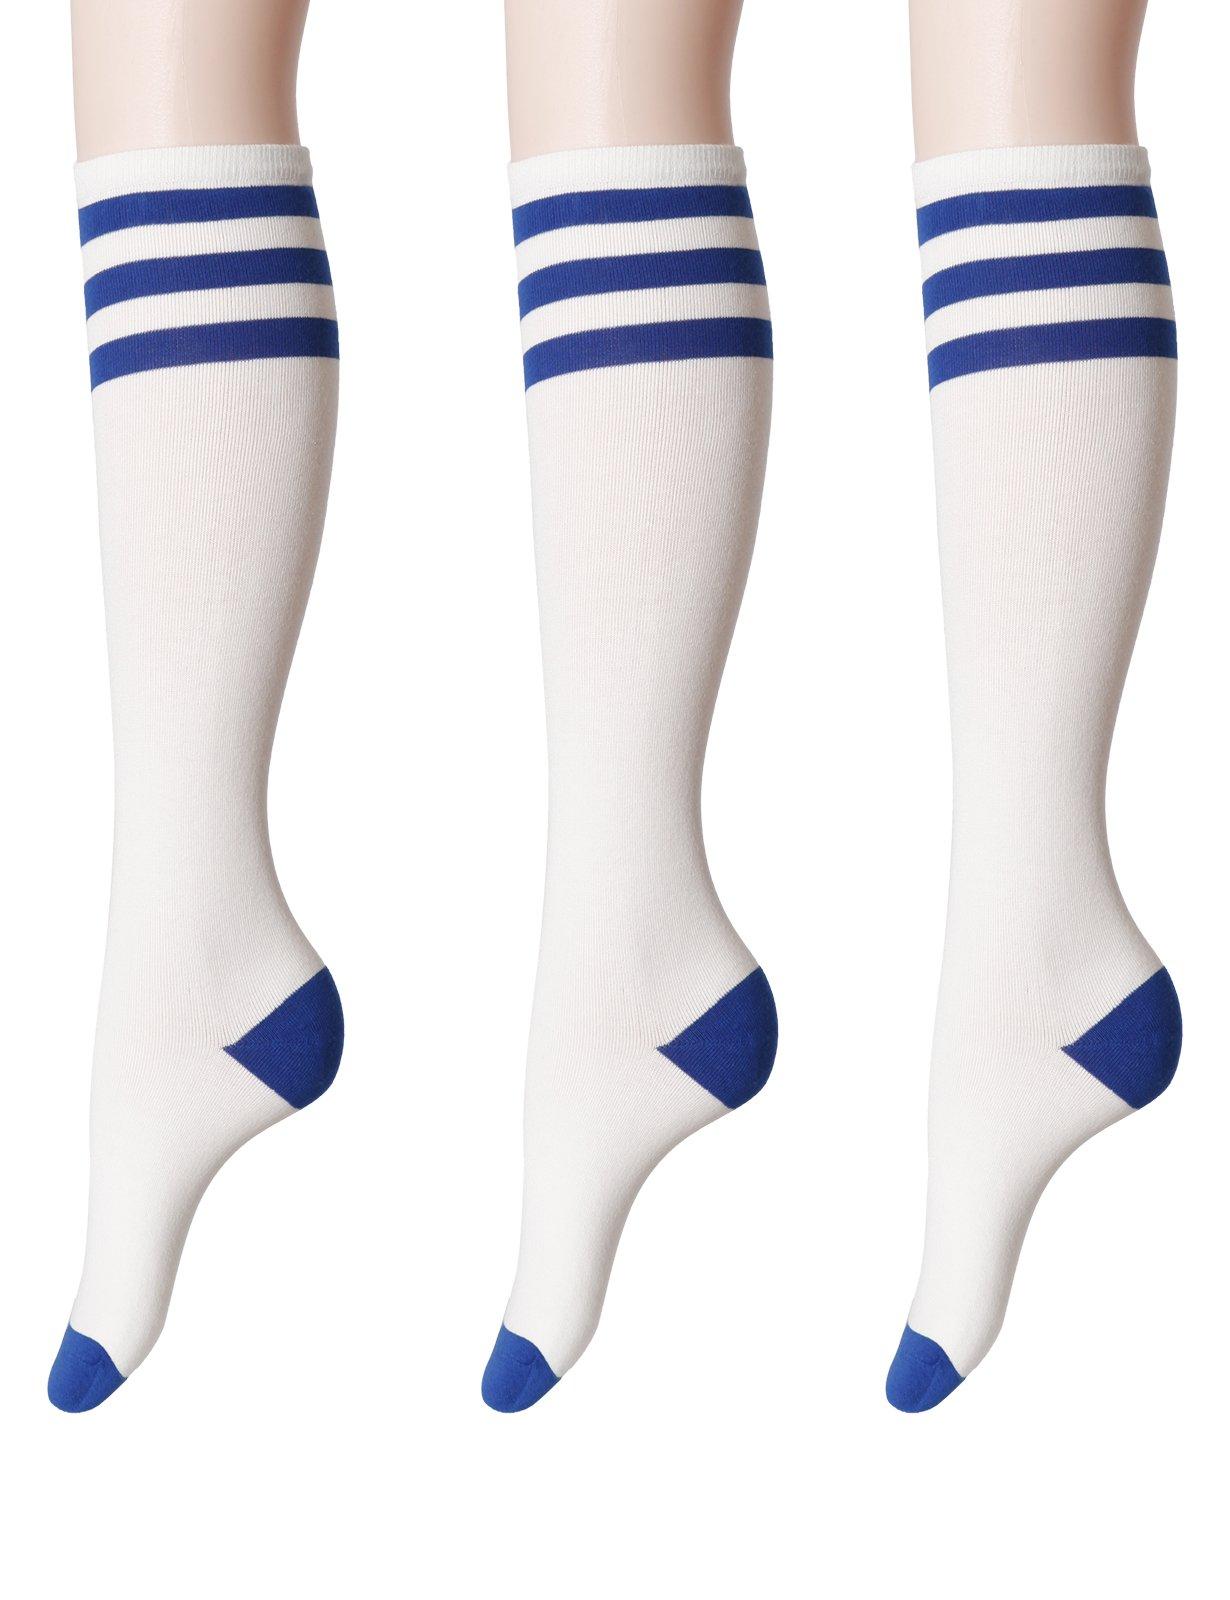 OSABASA Knee High Long Socks Stripe Extra Fine Combed Cotton BLUE (SET3KWMS077)